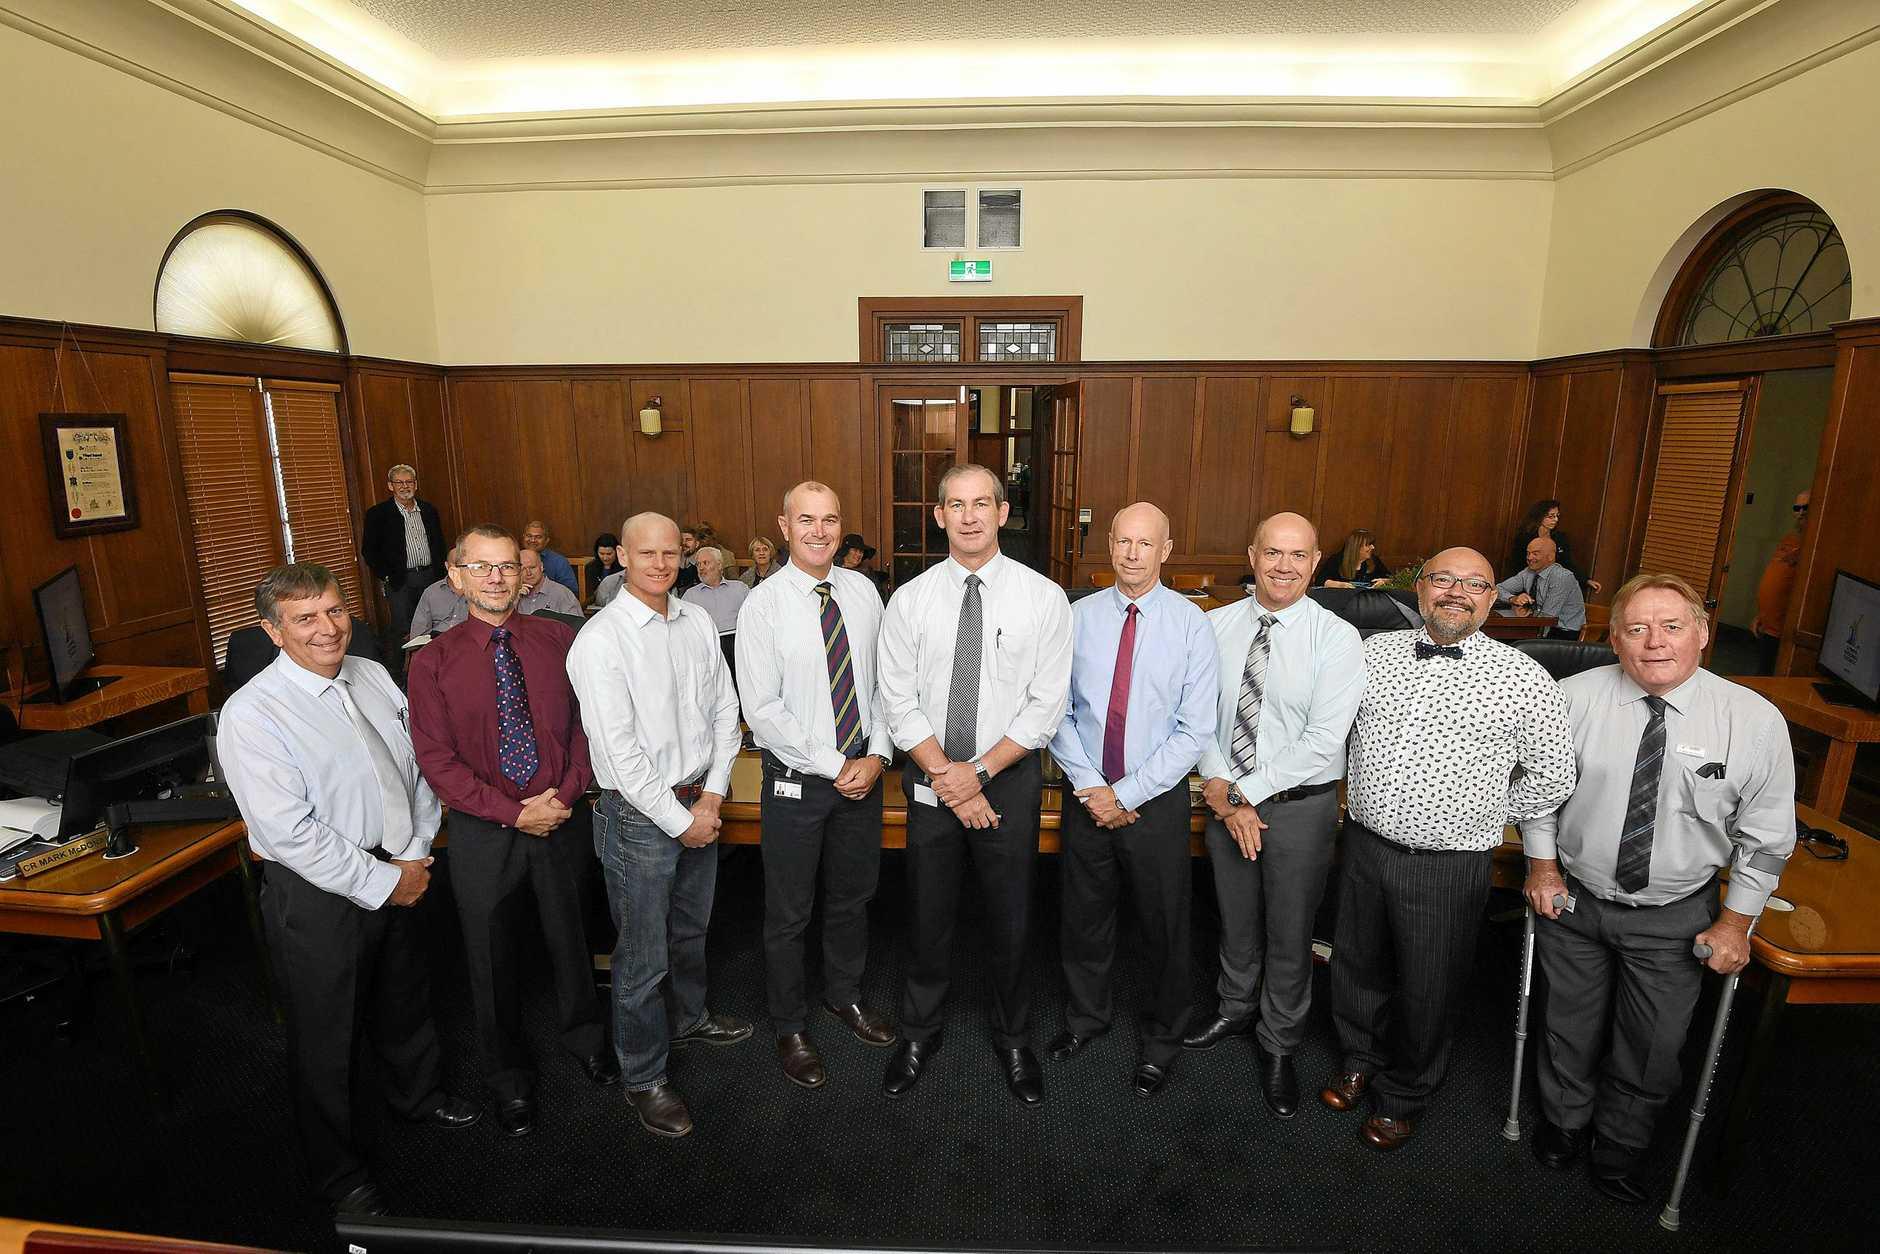 Gympie Council 2018 Hilary Smerdon, Dan Stewart, Glen Hartwig, Bob Leitch, Mick Curran, Bob Fredman, Mal Gear, Daryl Dodt and Mark McDonald.